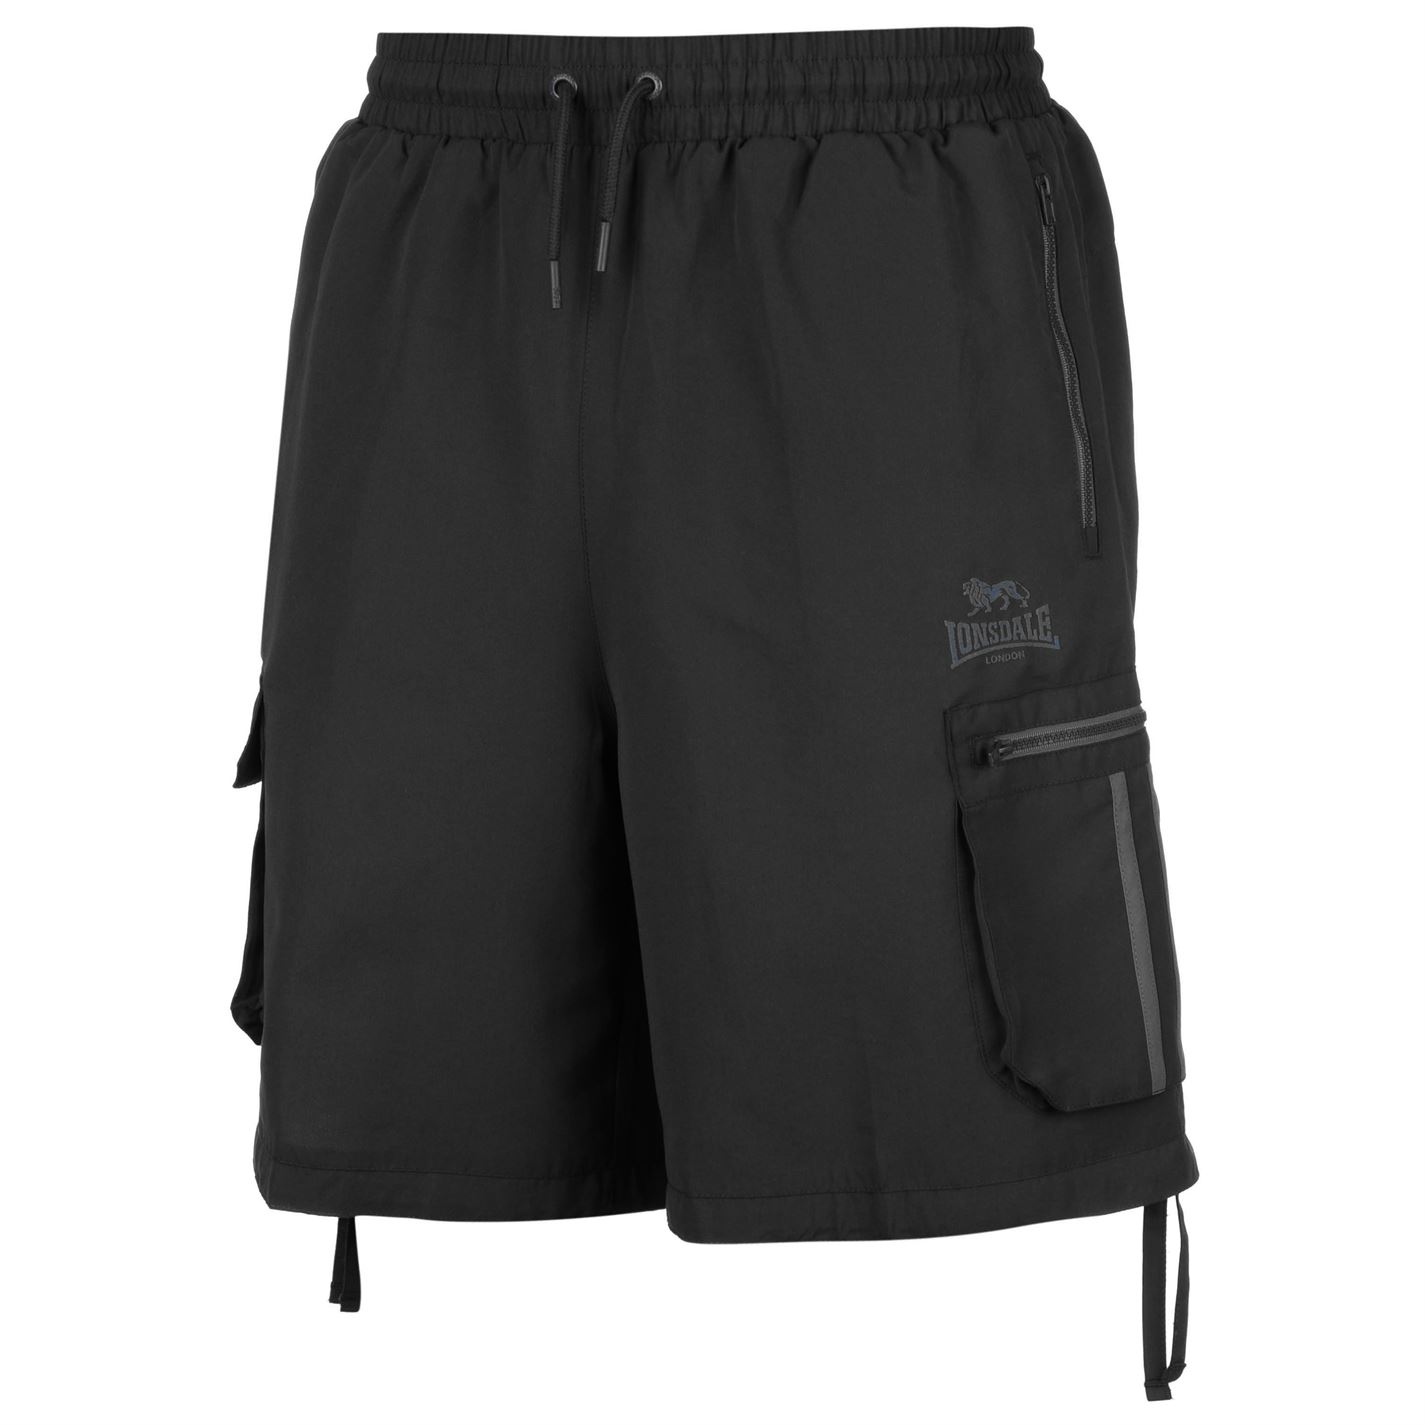 Kraťasy Lonsdale 2 Stripe Cargo Shorts Mens - Glami.cz 42631fe651